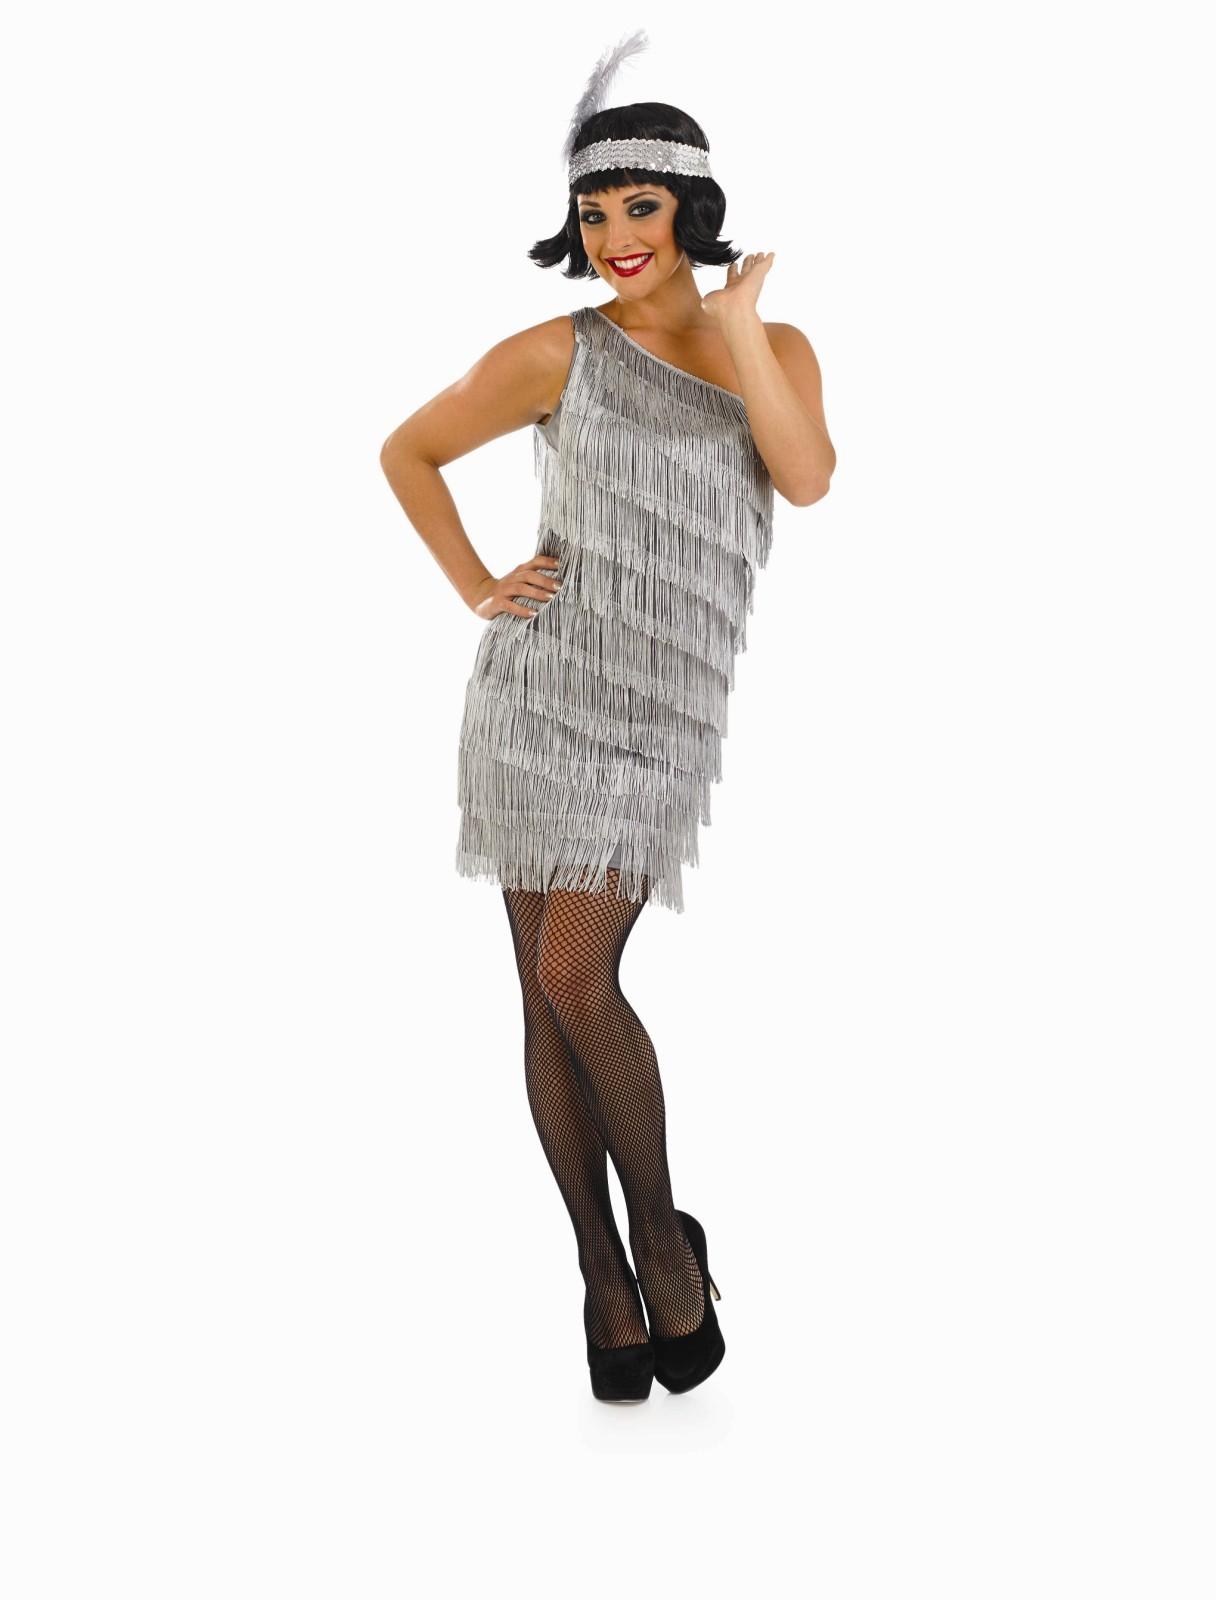 Womens 1920s flapper dress fancy dress costume adult flapper dress - Ladies Flapper Dress Costume For 20s 30s Moll